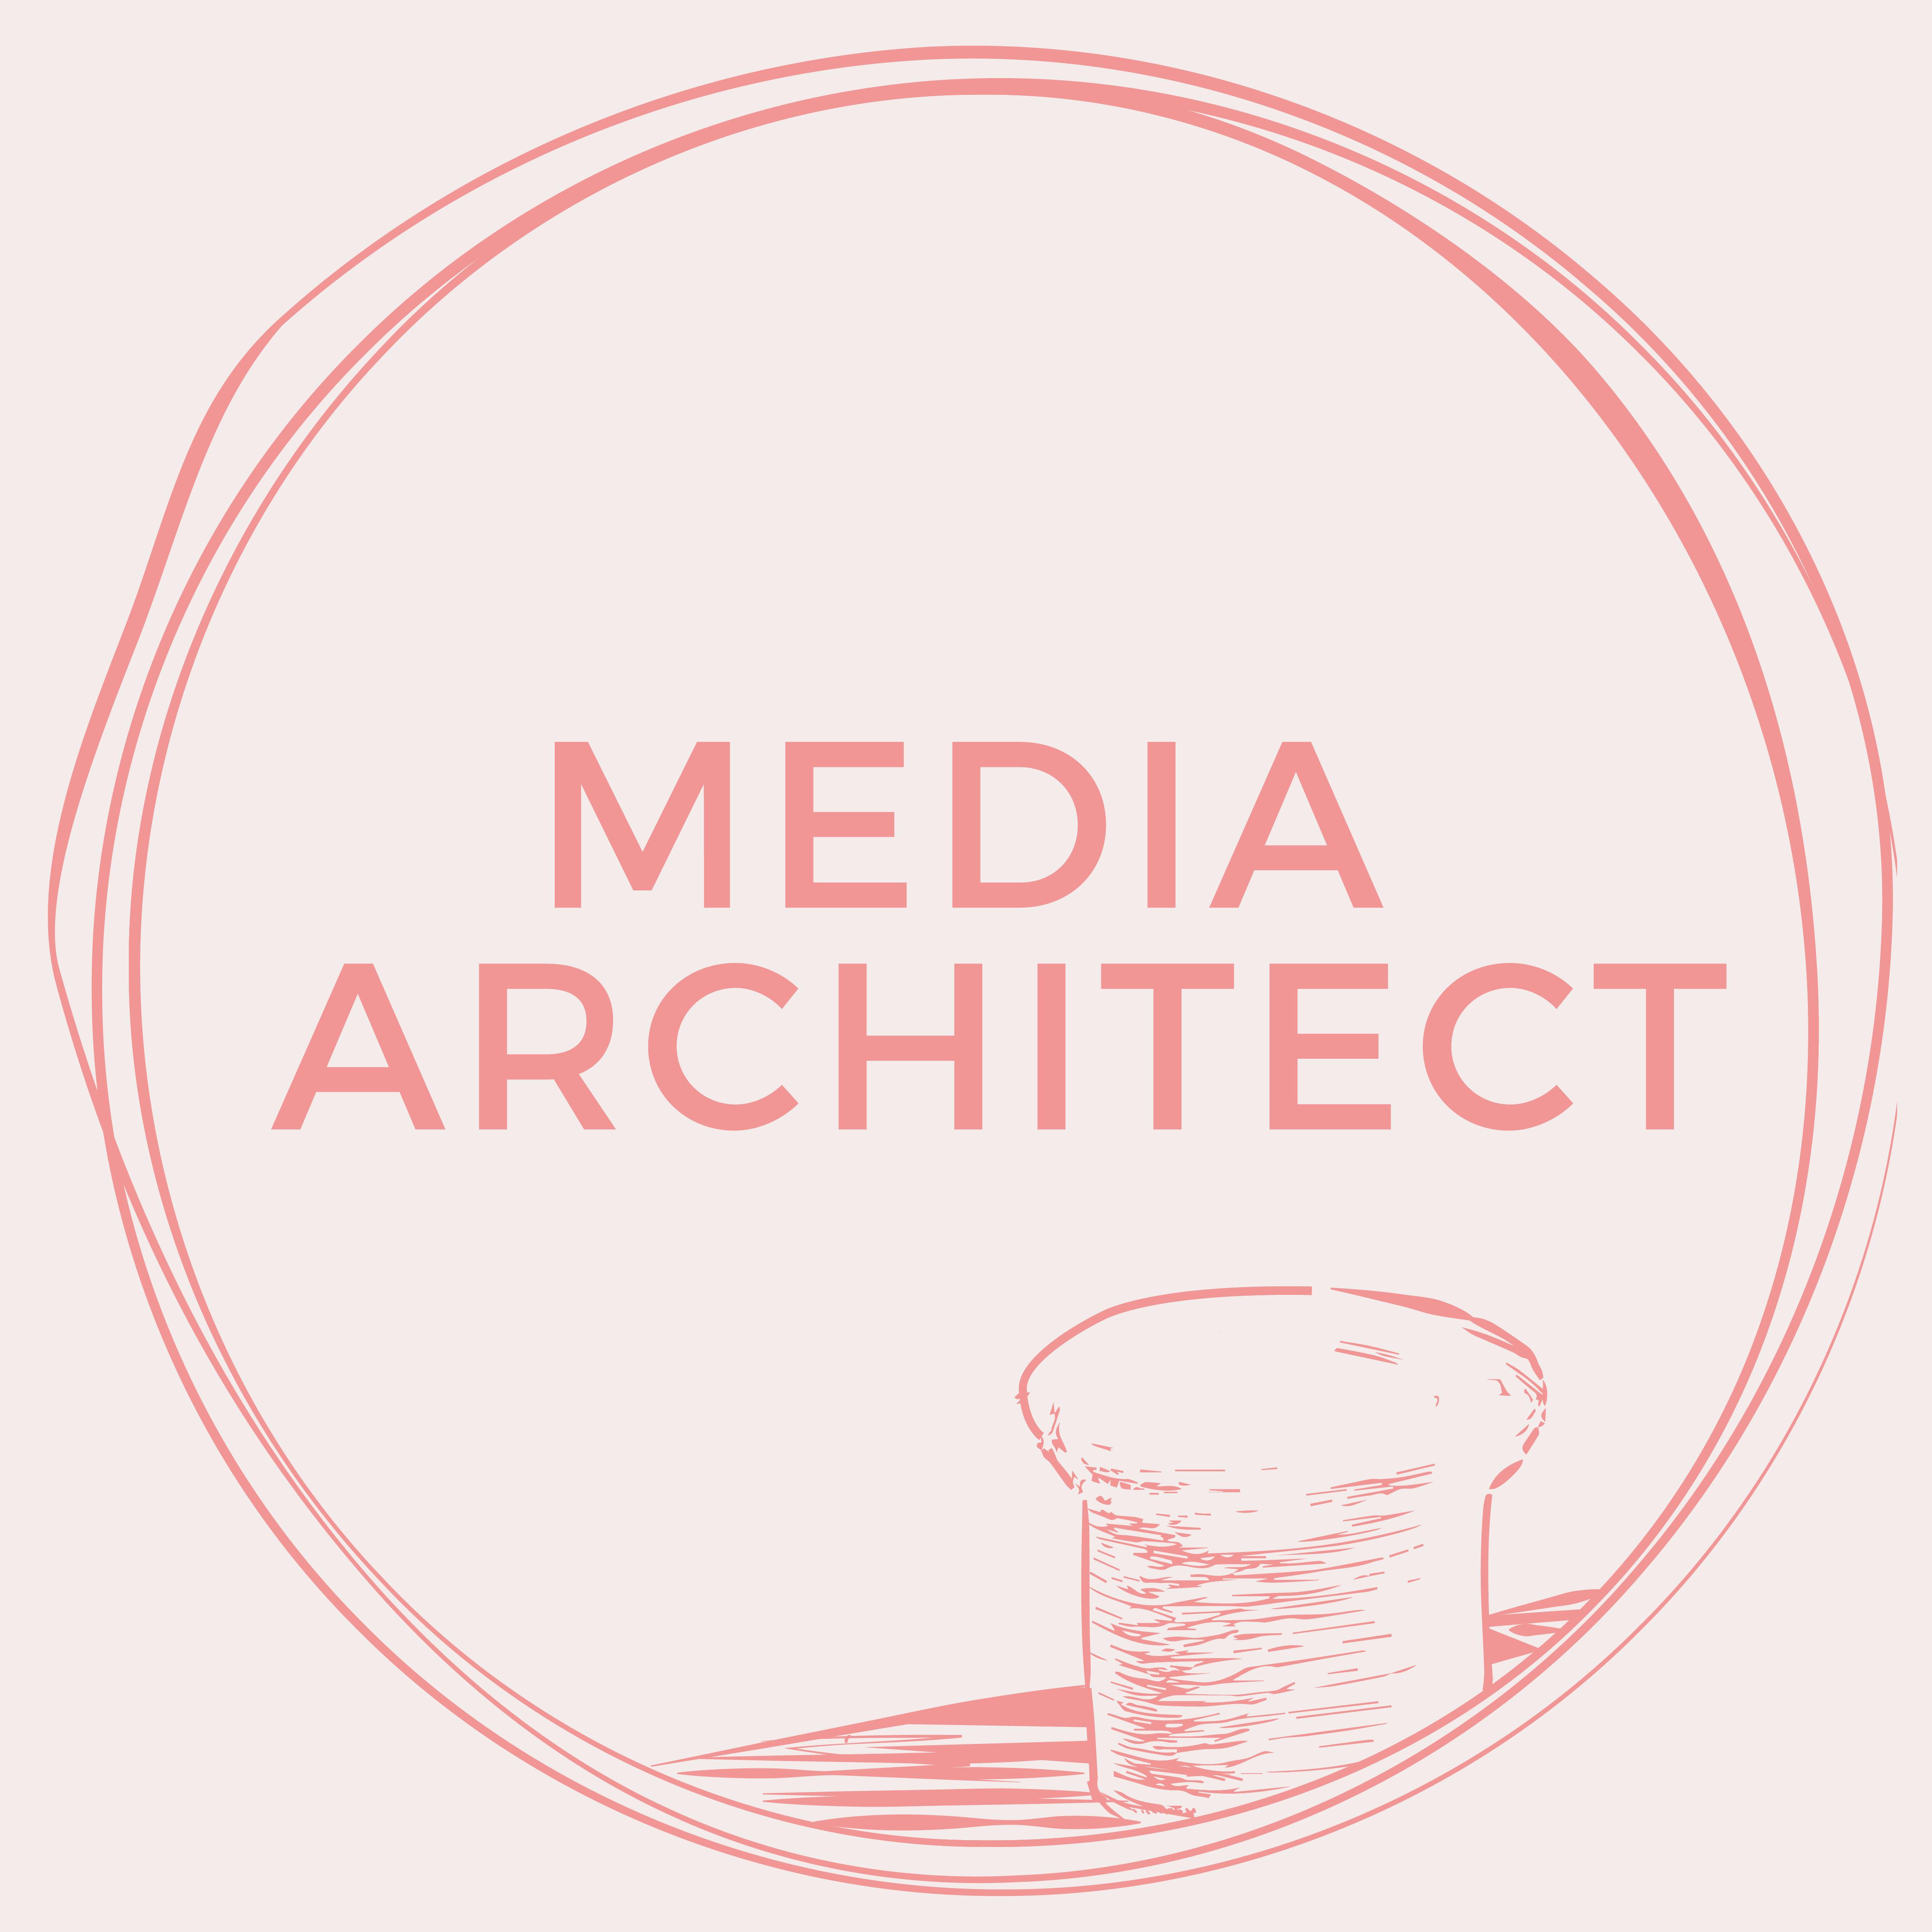 Media-Architect logo